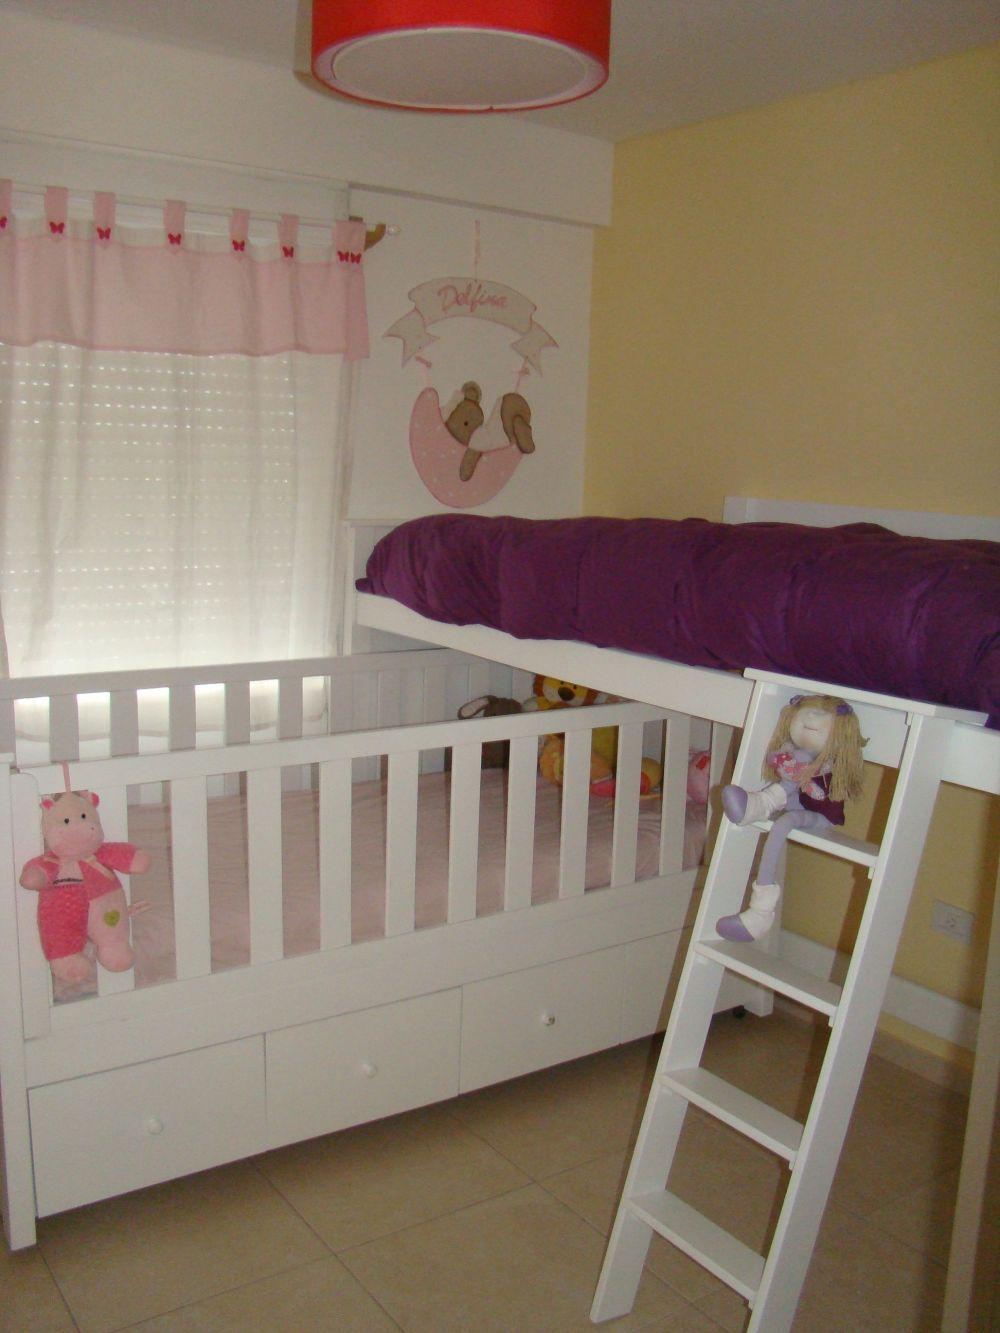 Muebles infantiles cuna funcional cajonera cama nido - Camas nido infantiles merkamueble ...